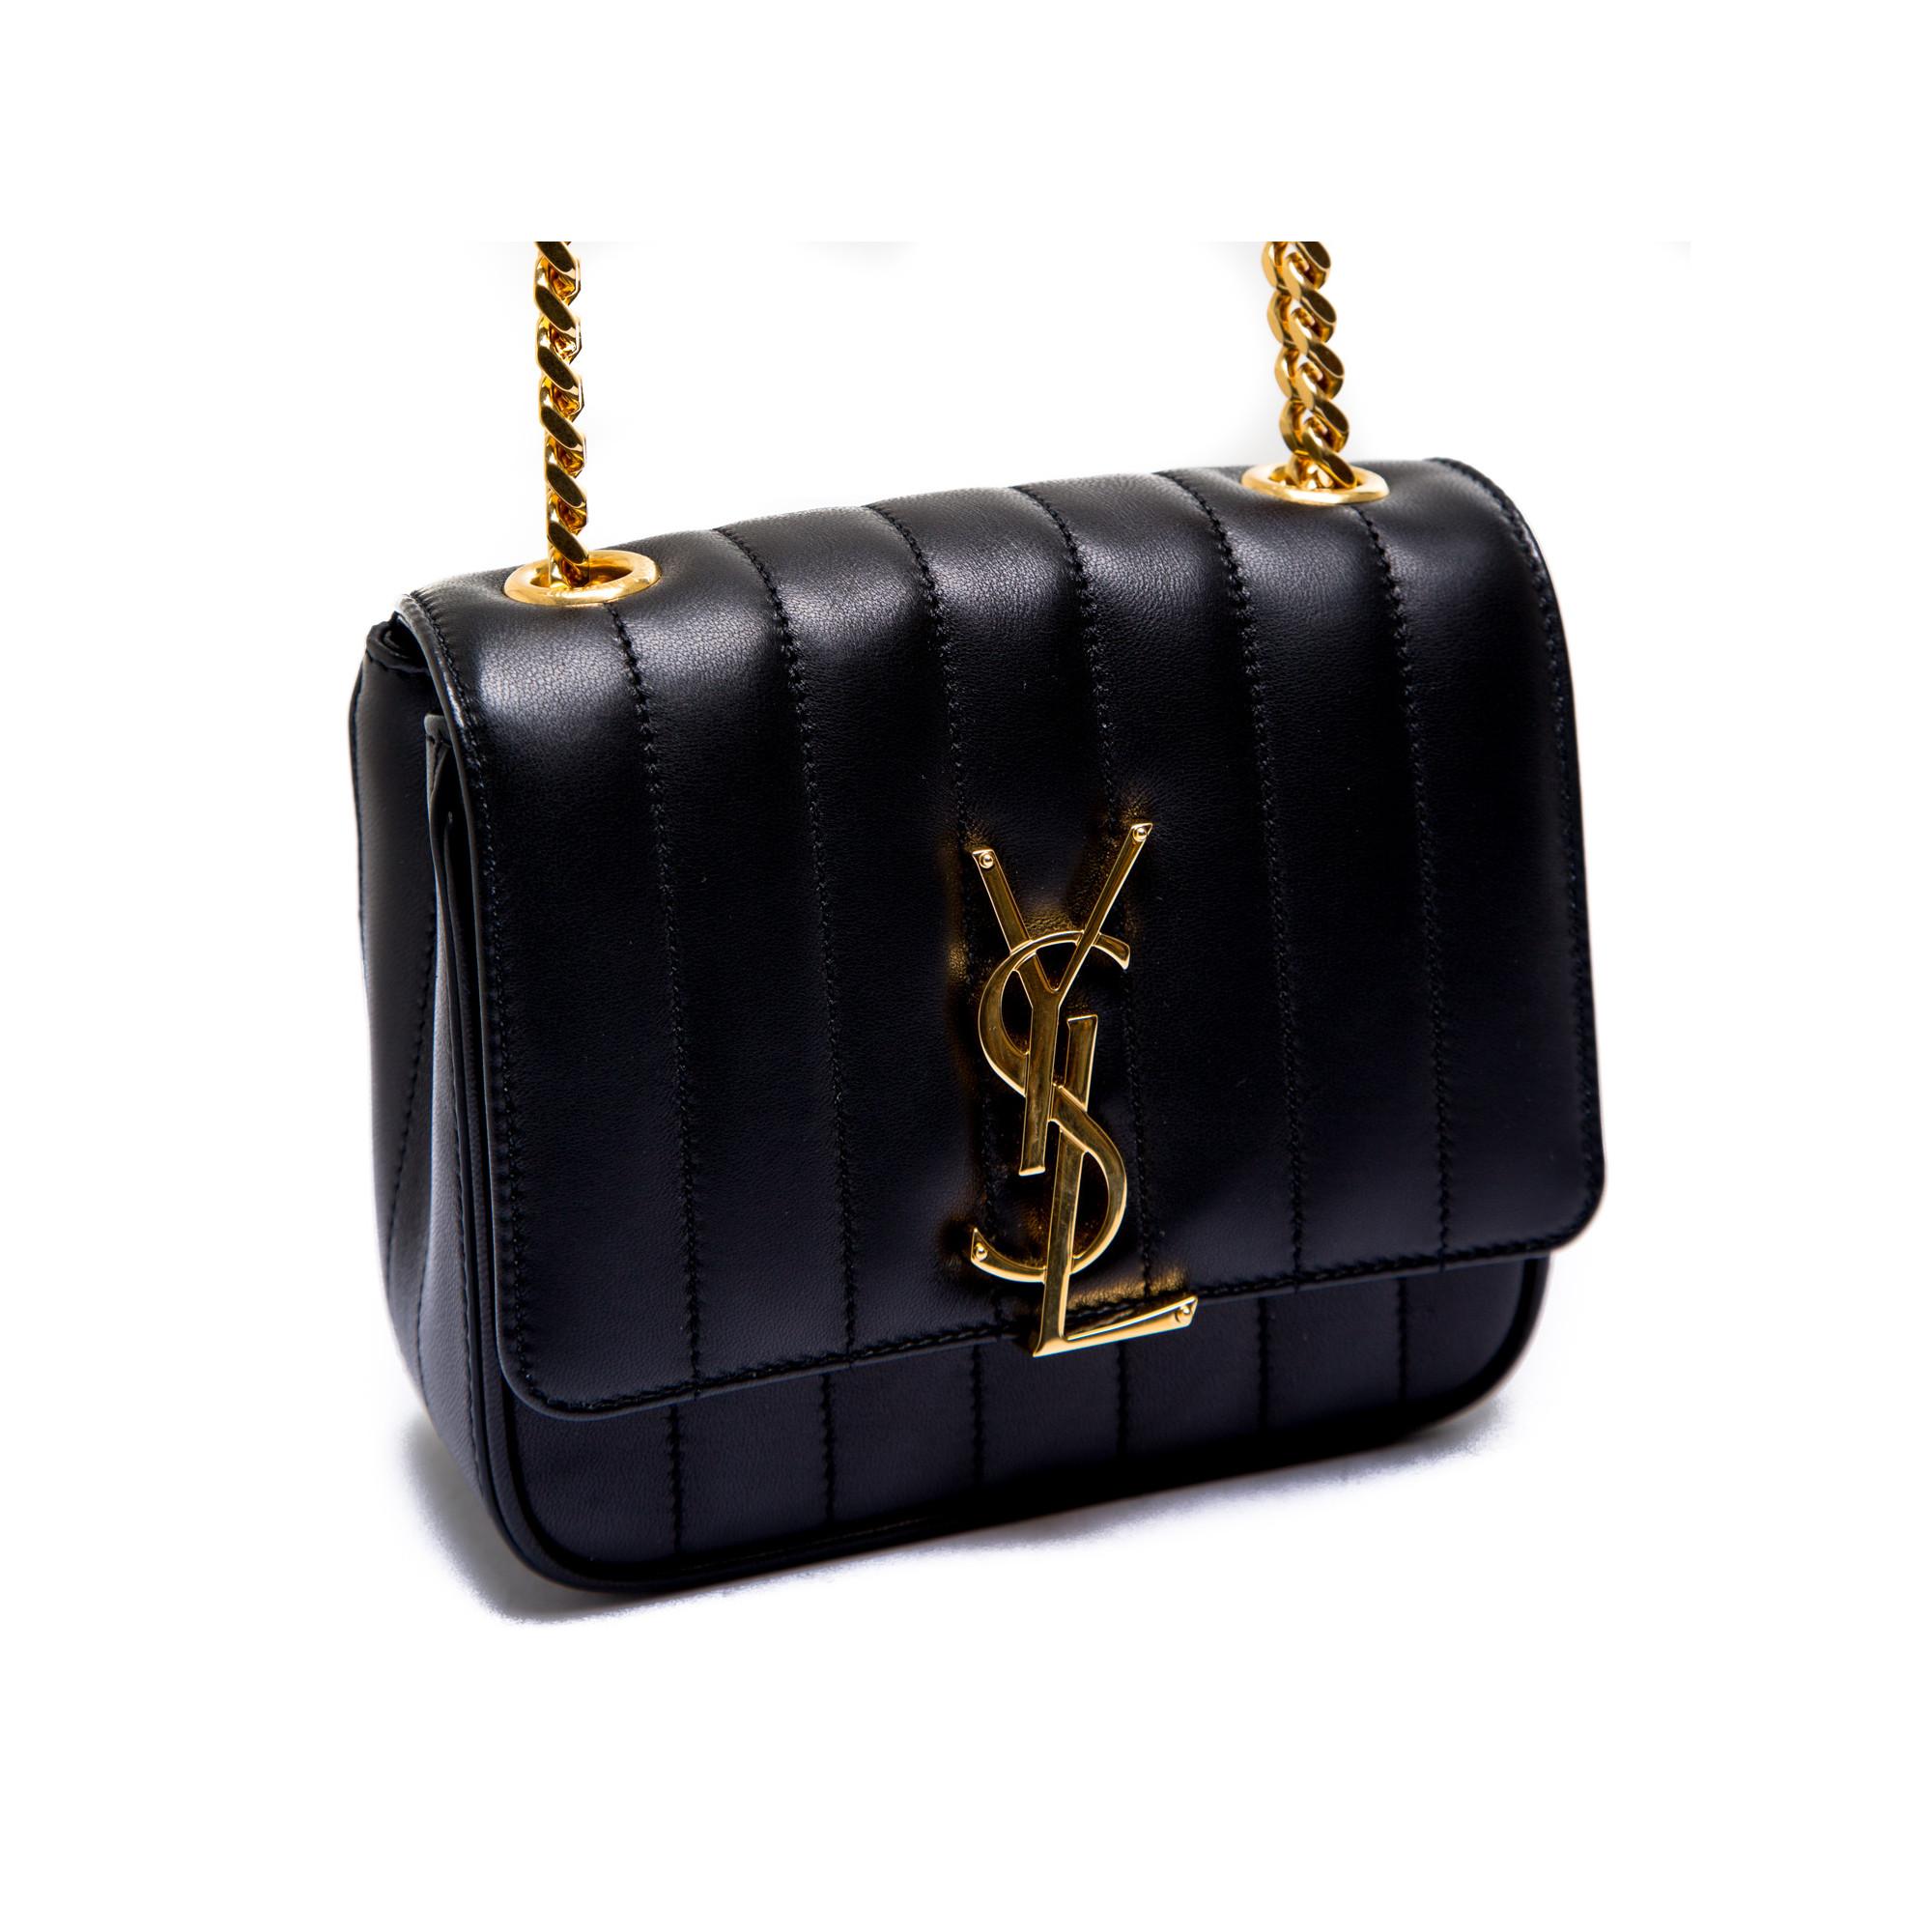 597cb02aa7 ... Saint Laurent ysl bag mng vicky s black Saint Laurent ysl bag mng vicky  s black